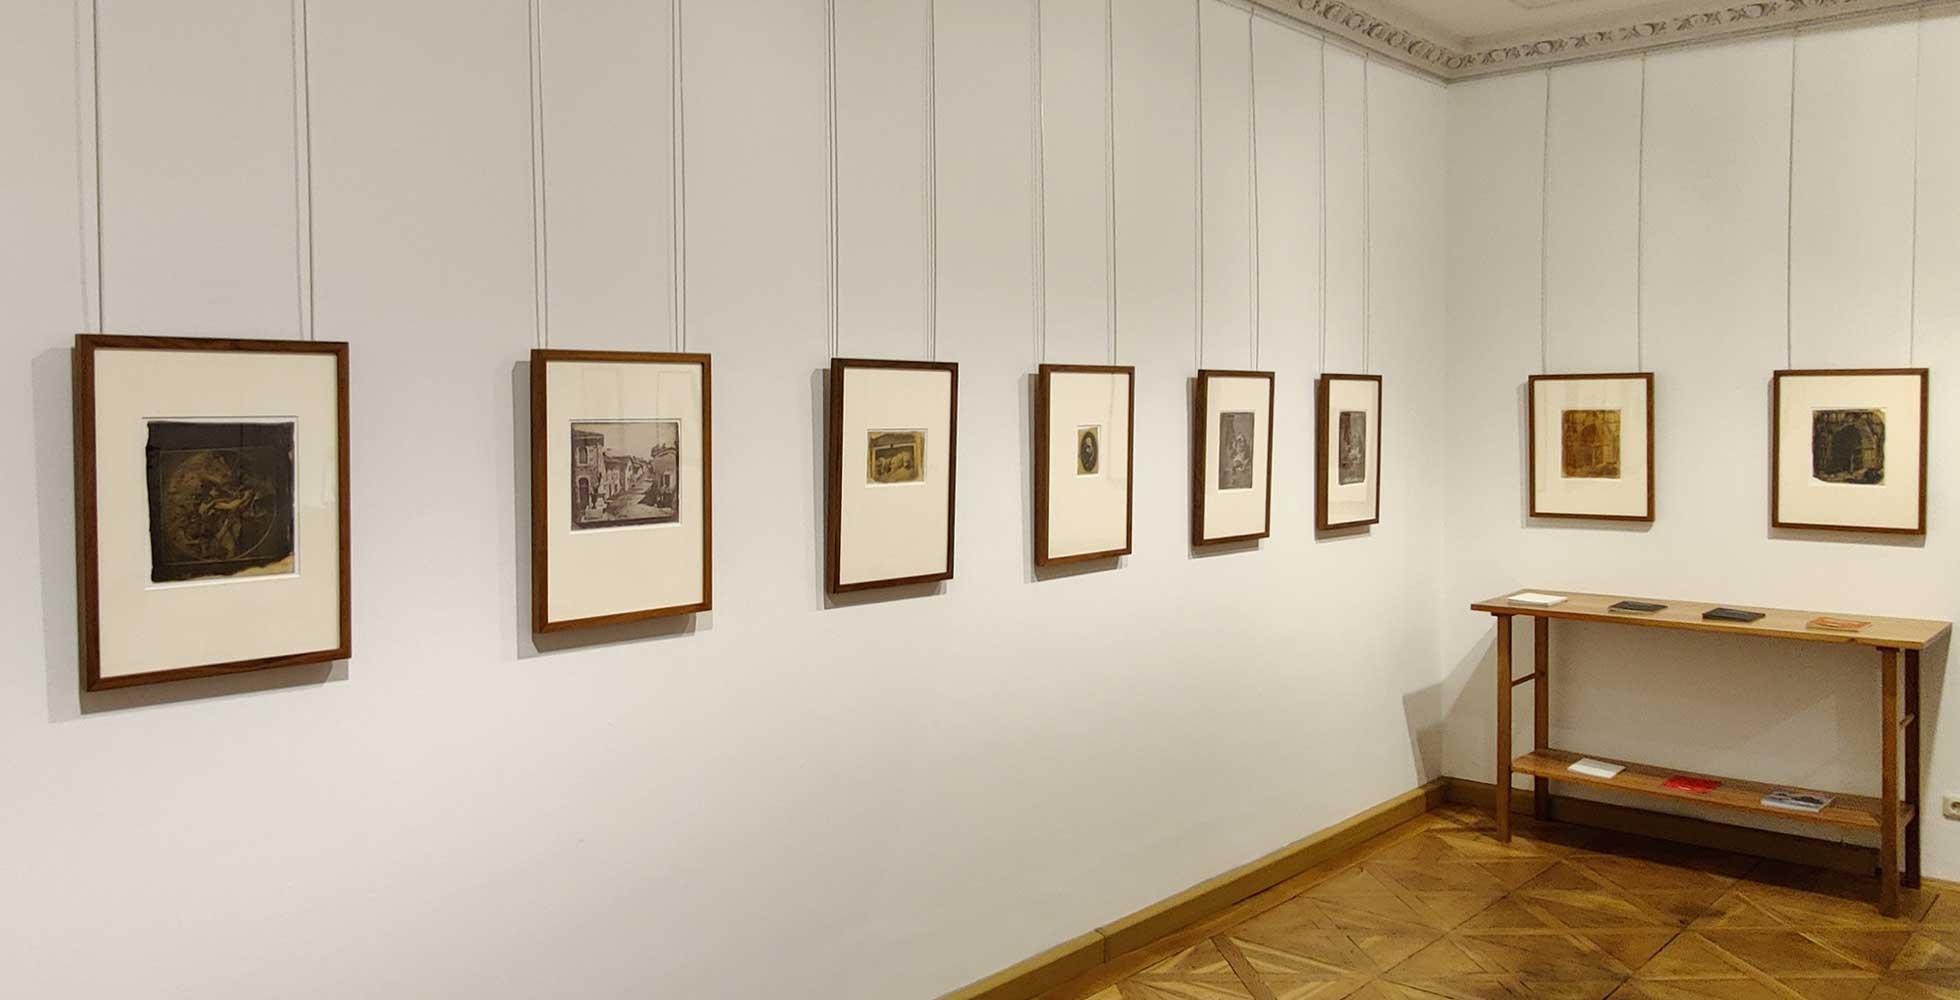 exhibition_Poitevin_DanielBlau_background_002